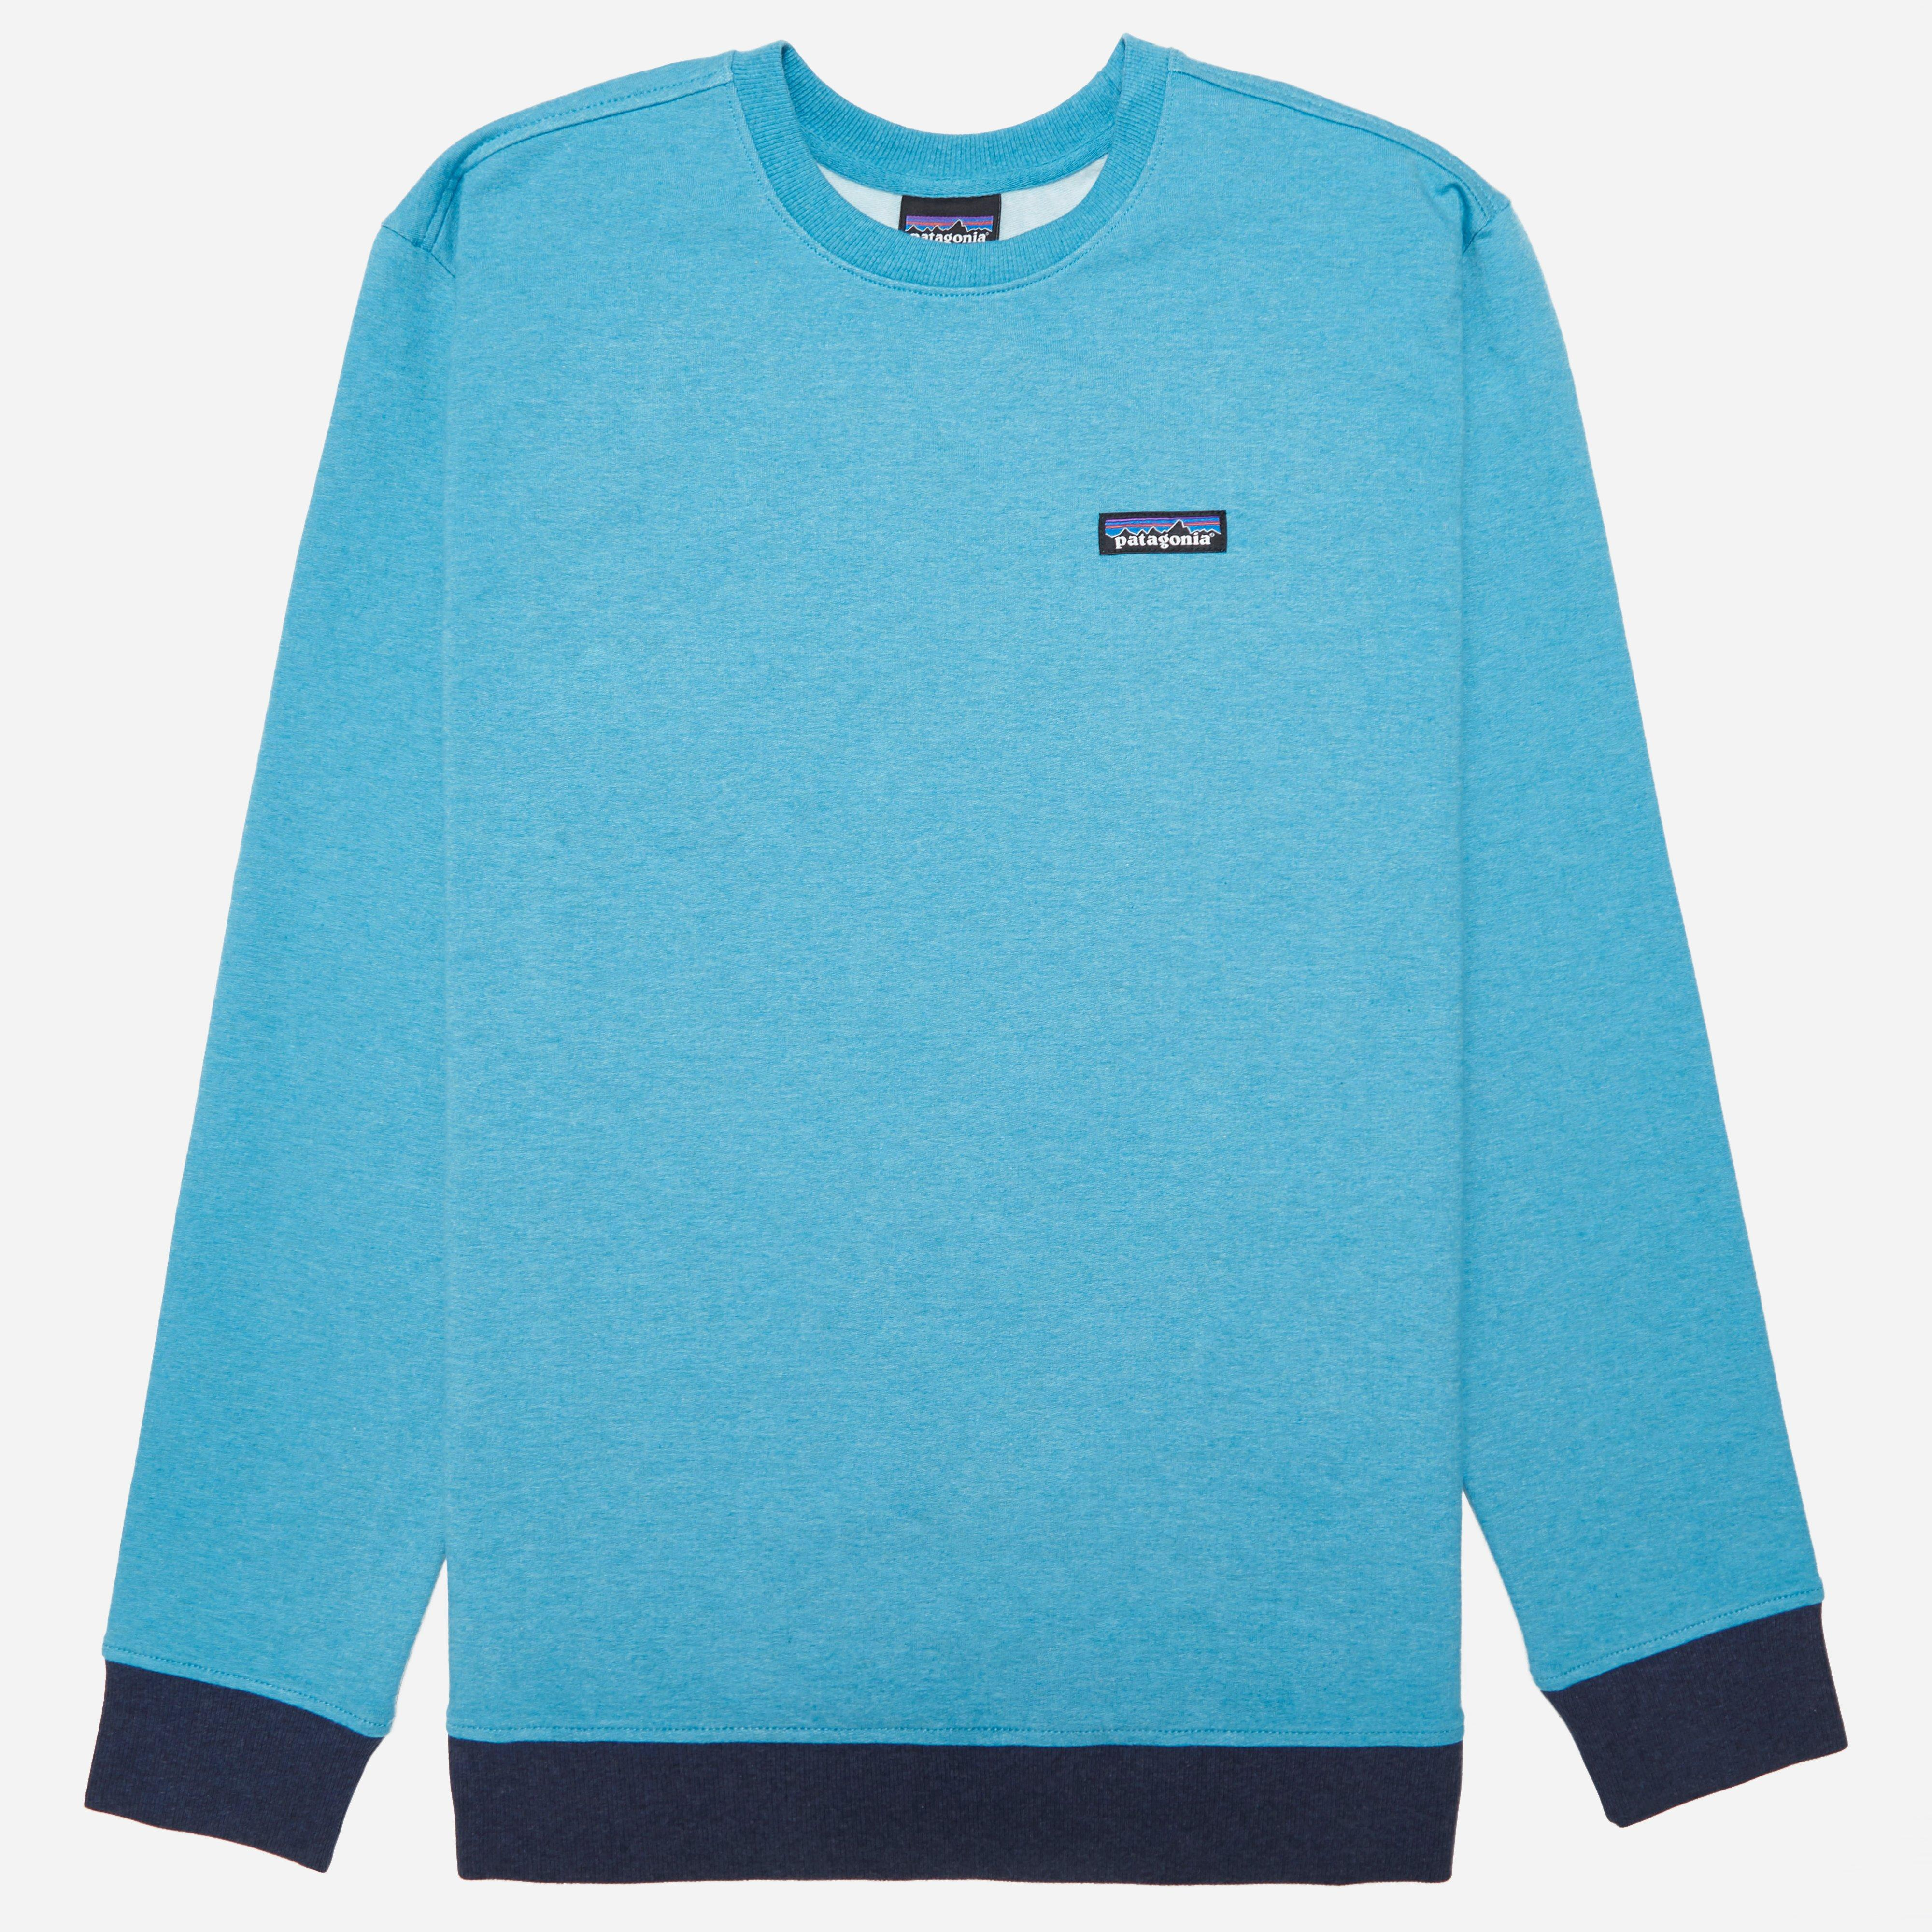 Patagonia P6 Label MW Crew Sweatshirt